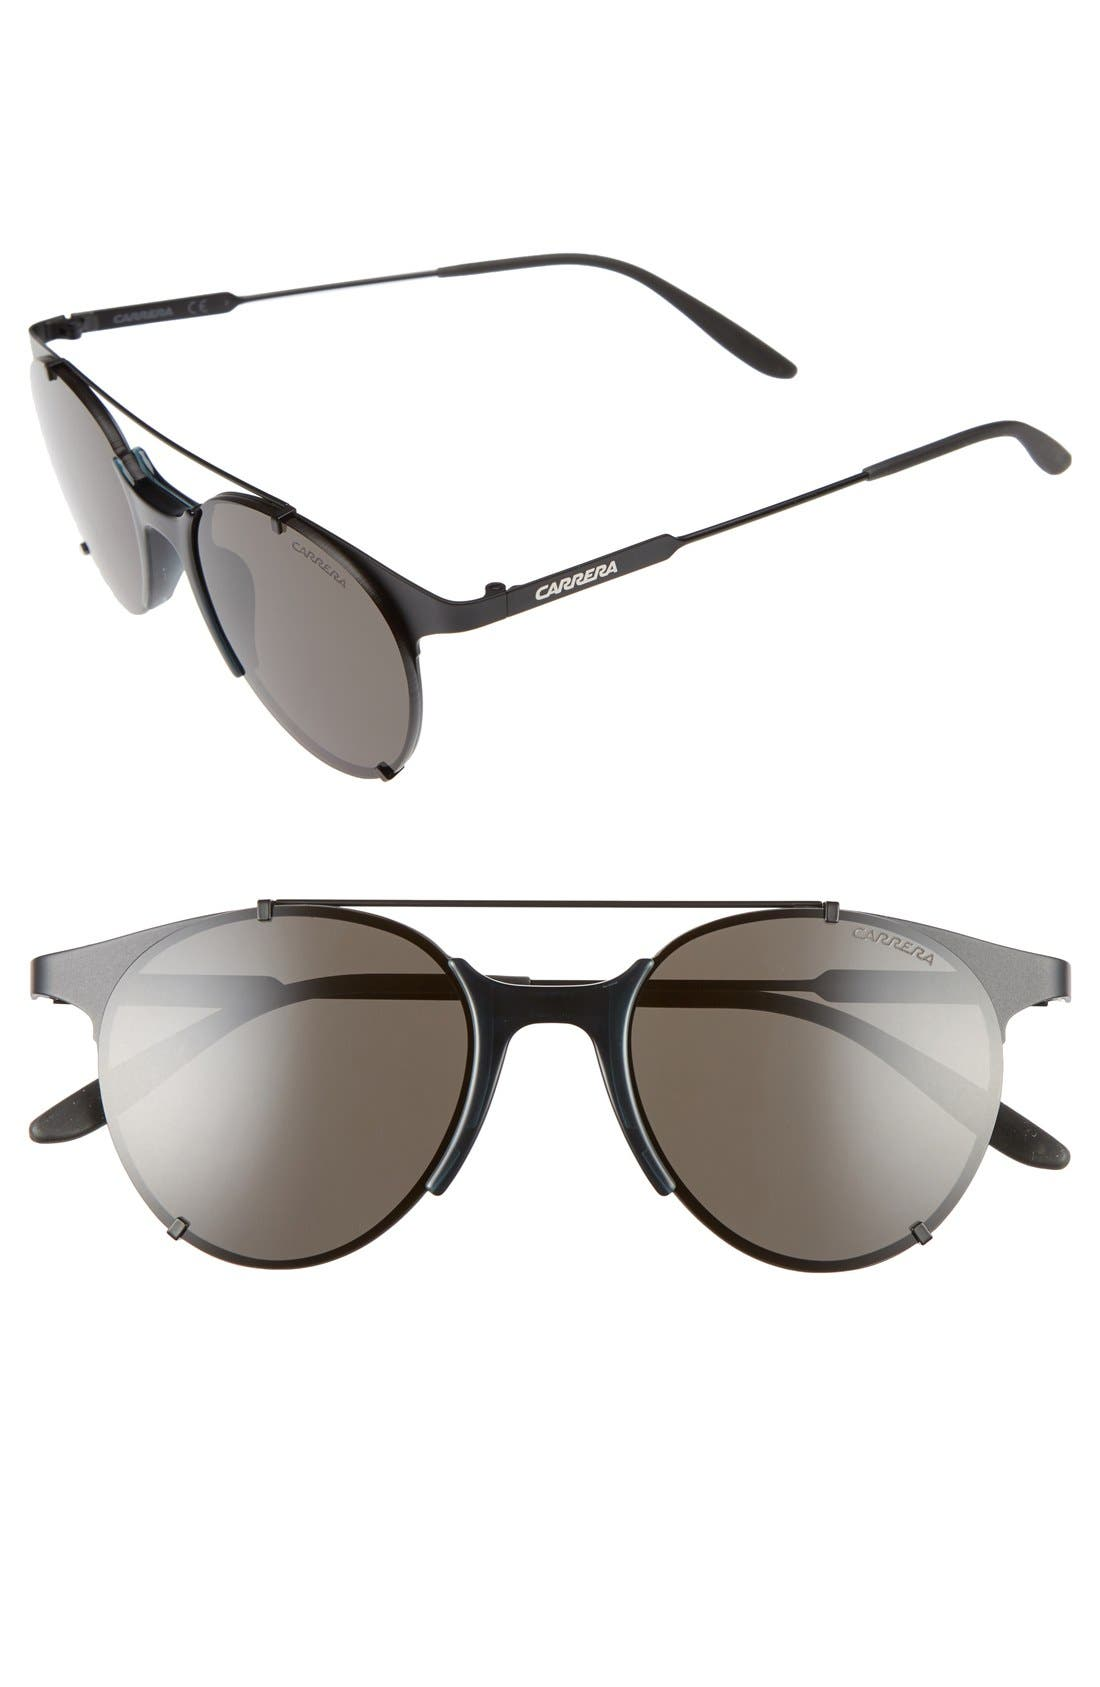 CA128/S 52mm Sunglasses,                             Main thumbnail 1, color,                             001